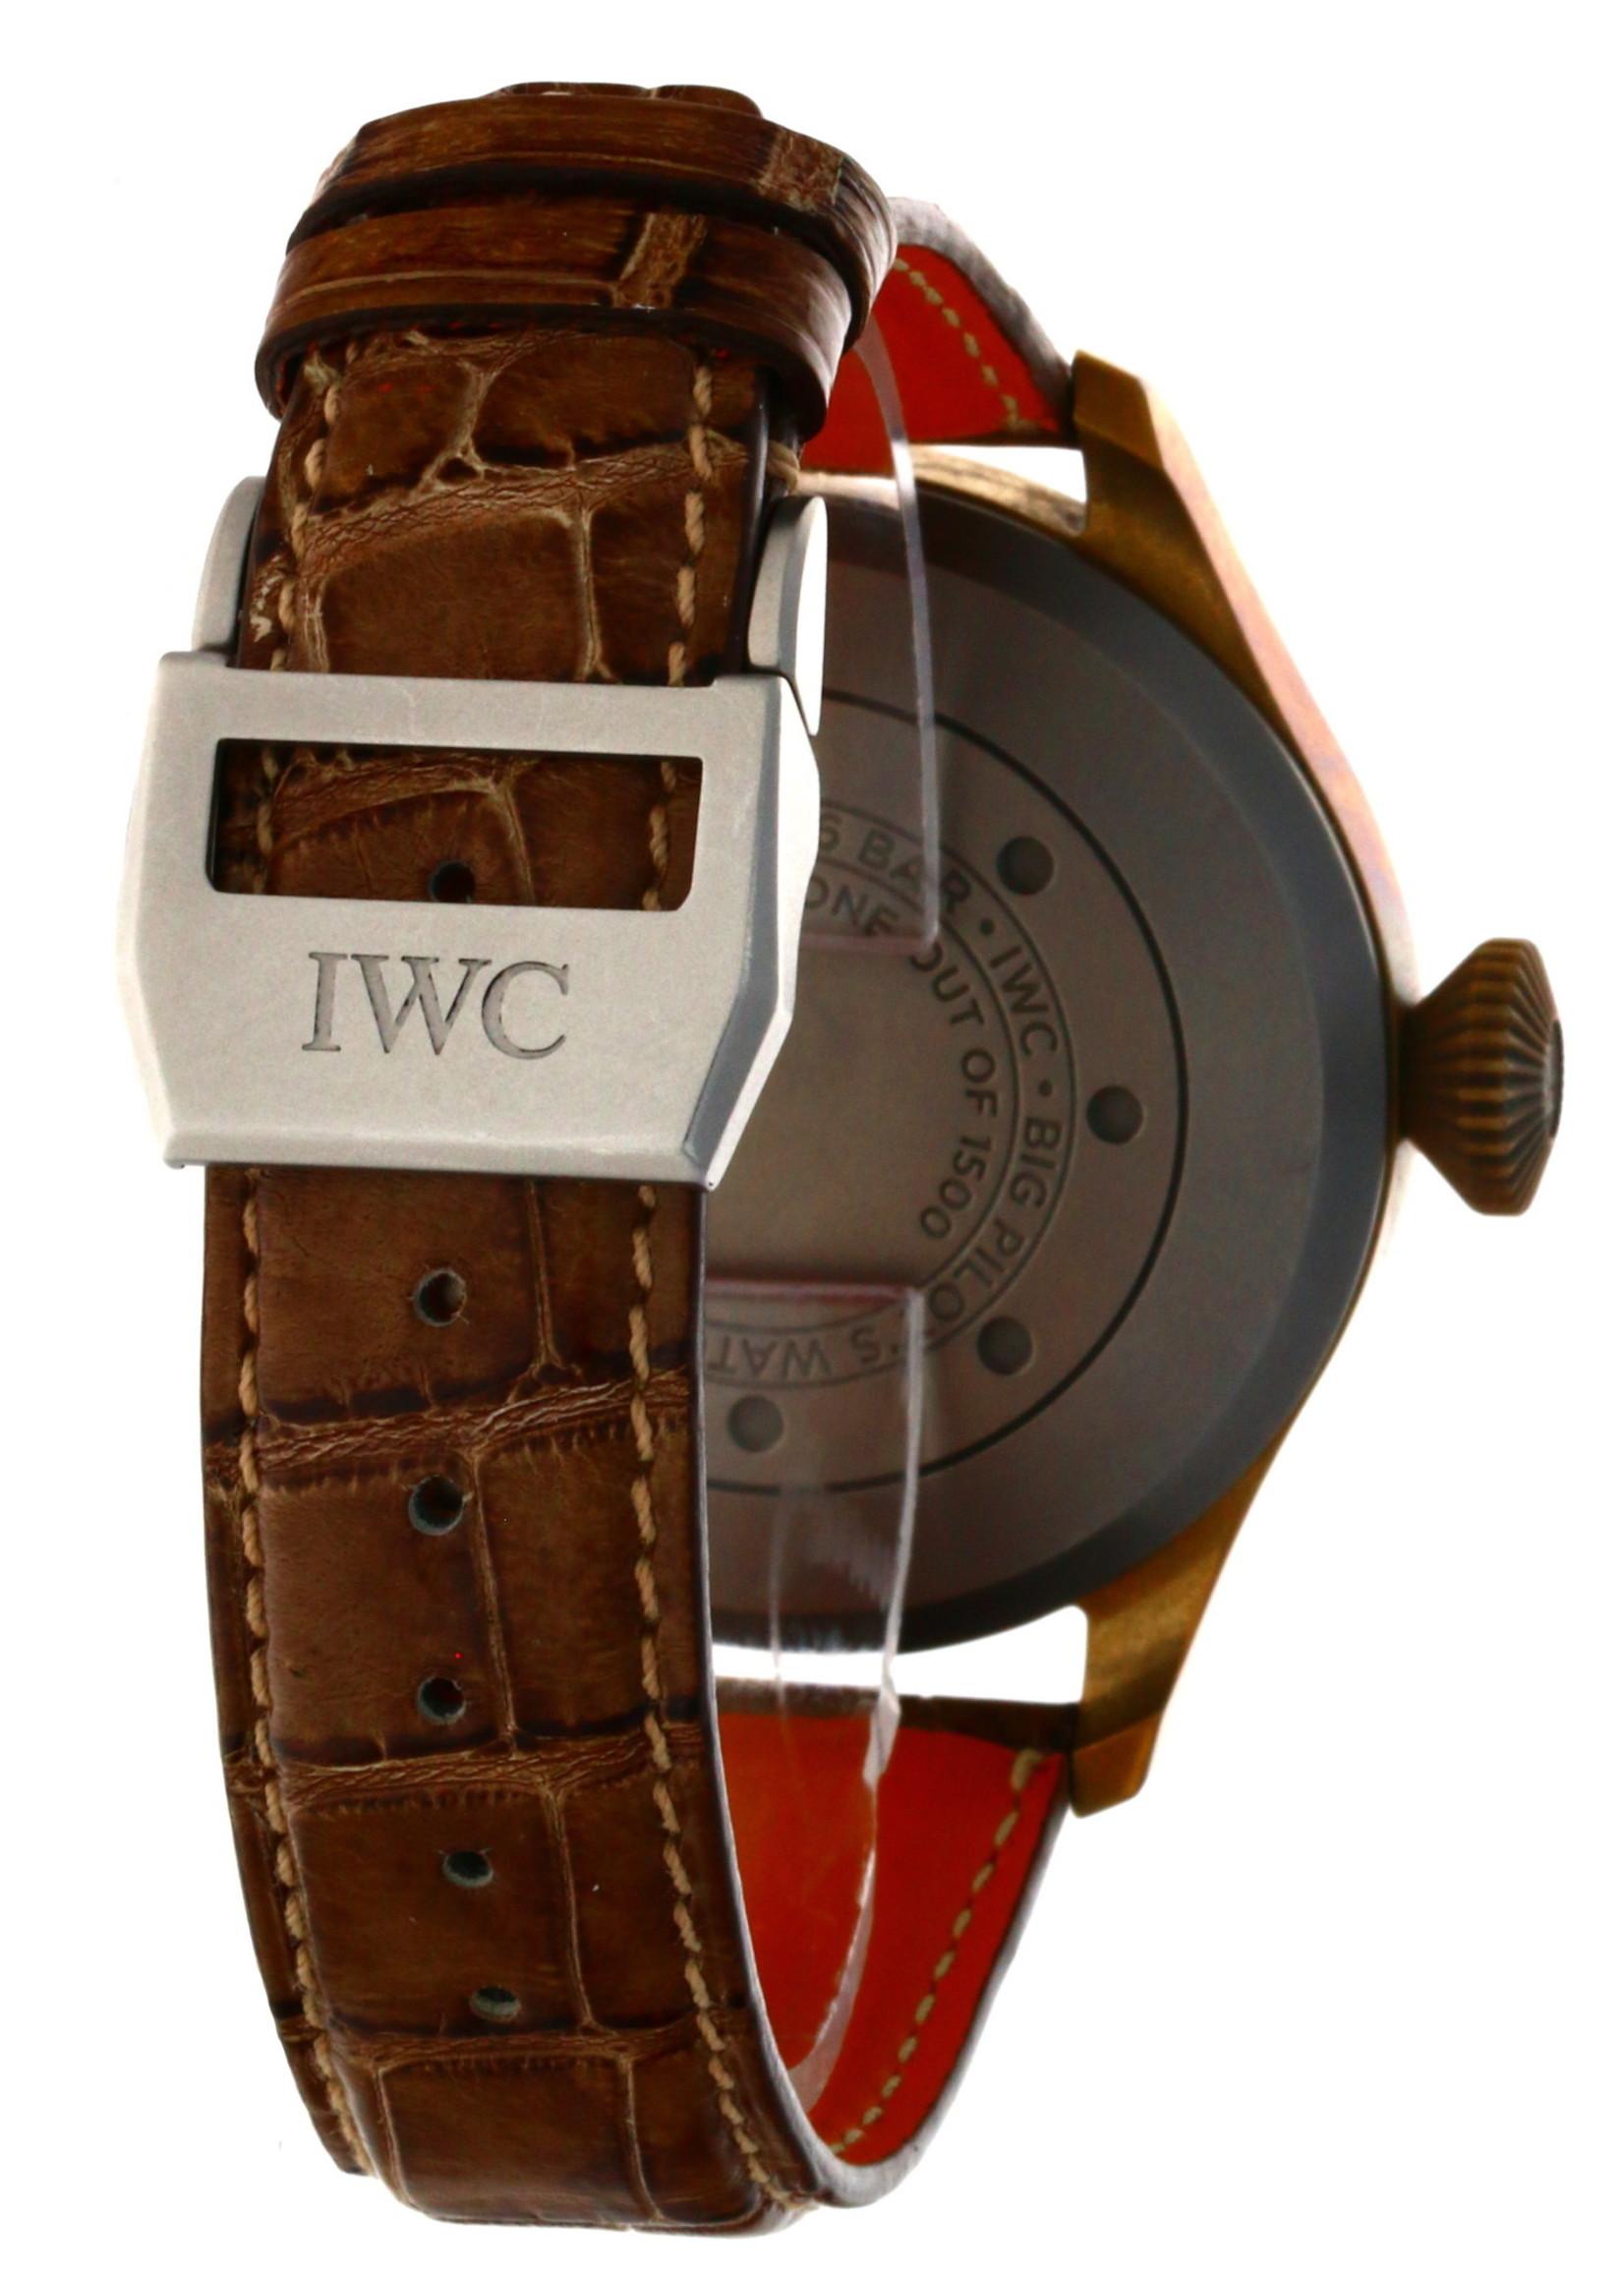 IWC IWC BIG PILOT HERITAGE #IW501005 (2018 B+P)